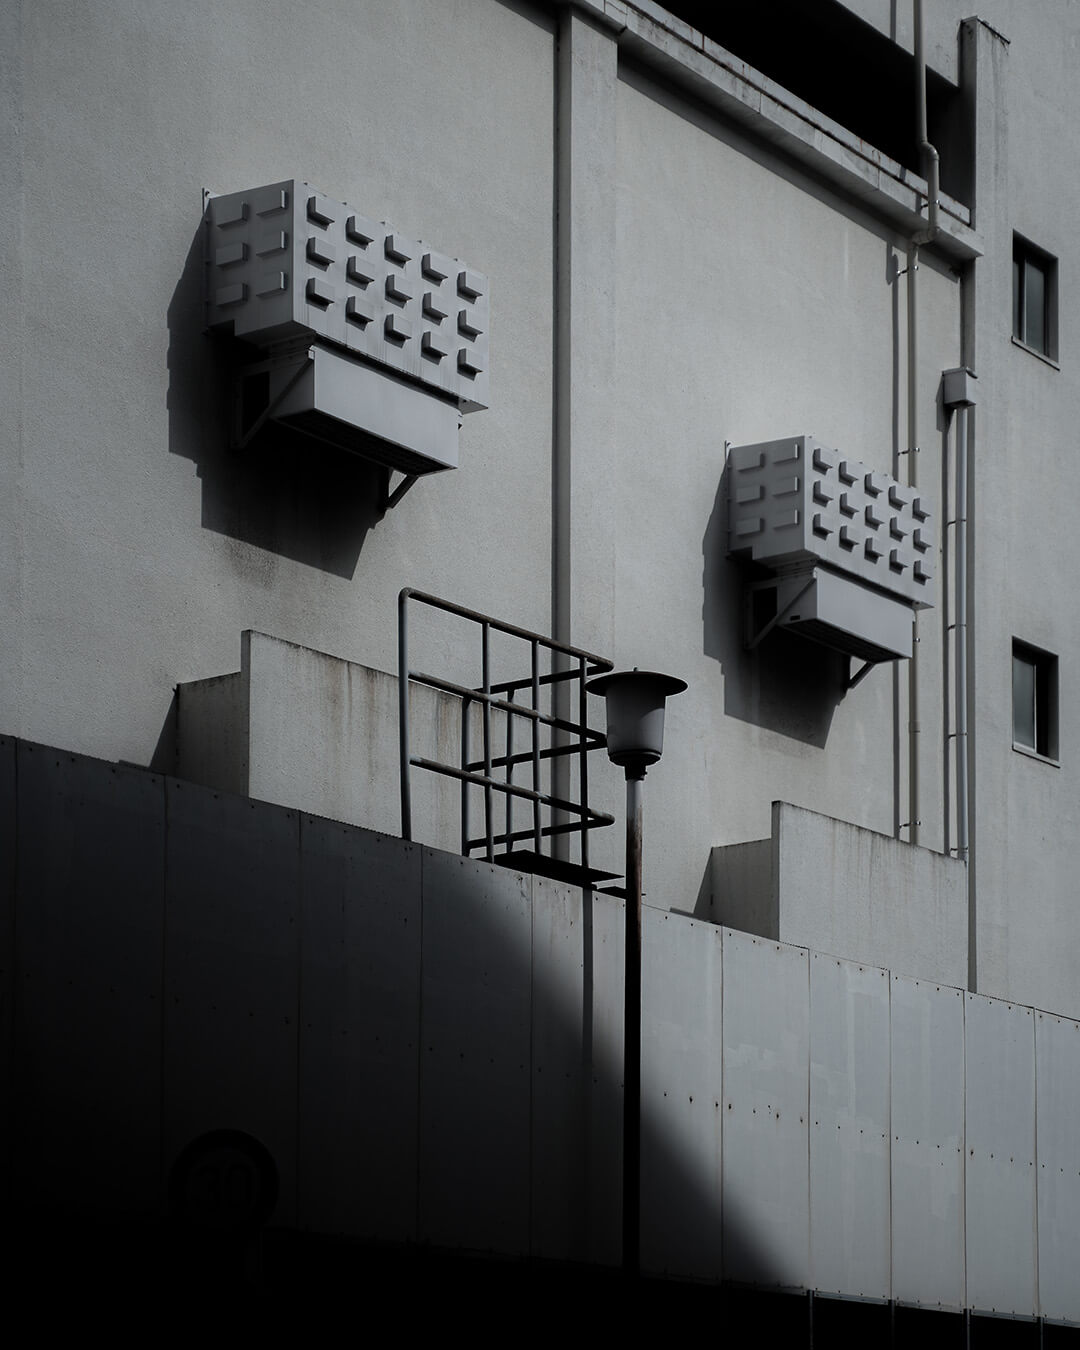 Malwin Béla Hürkey — Visual Communication Visual Journal